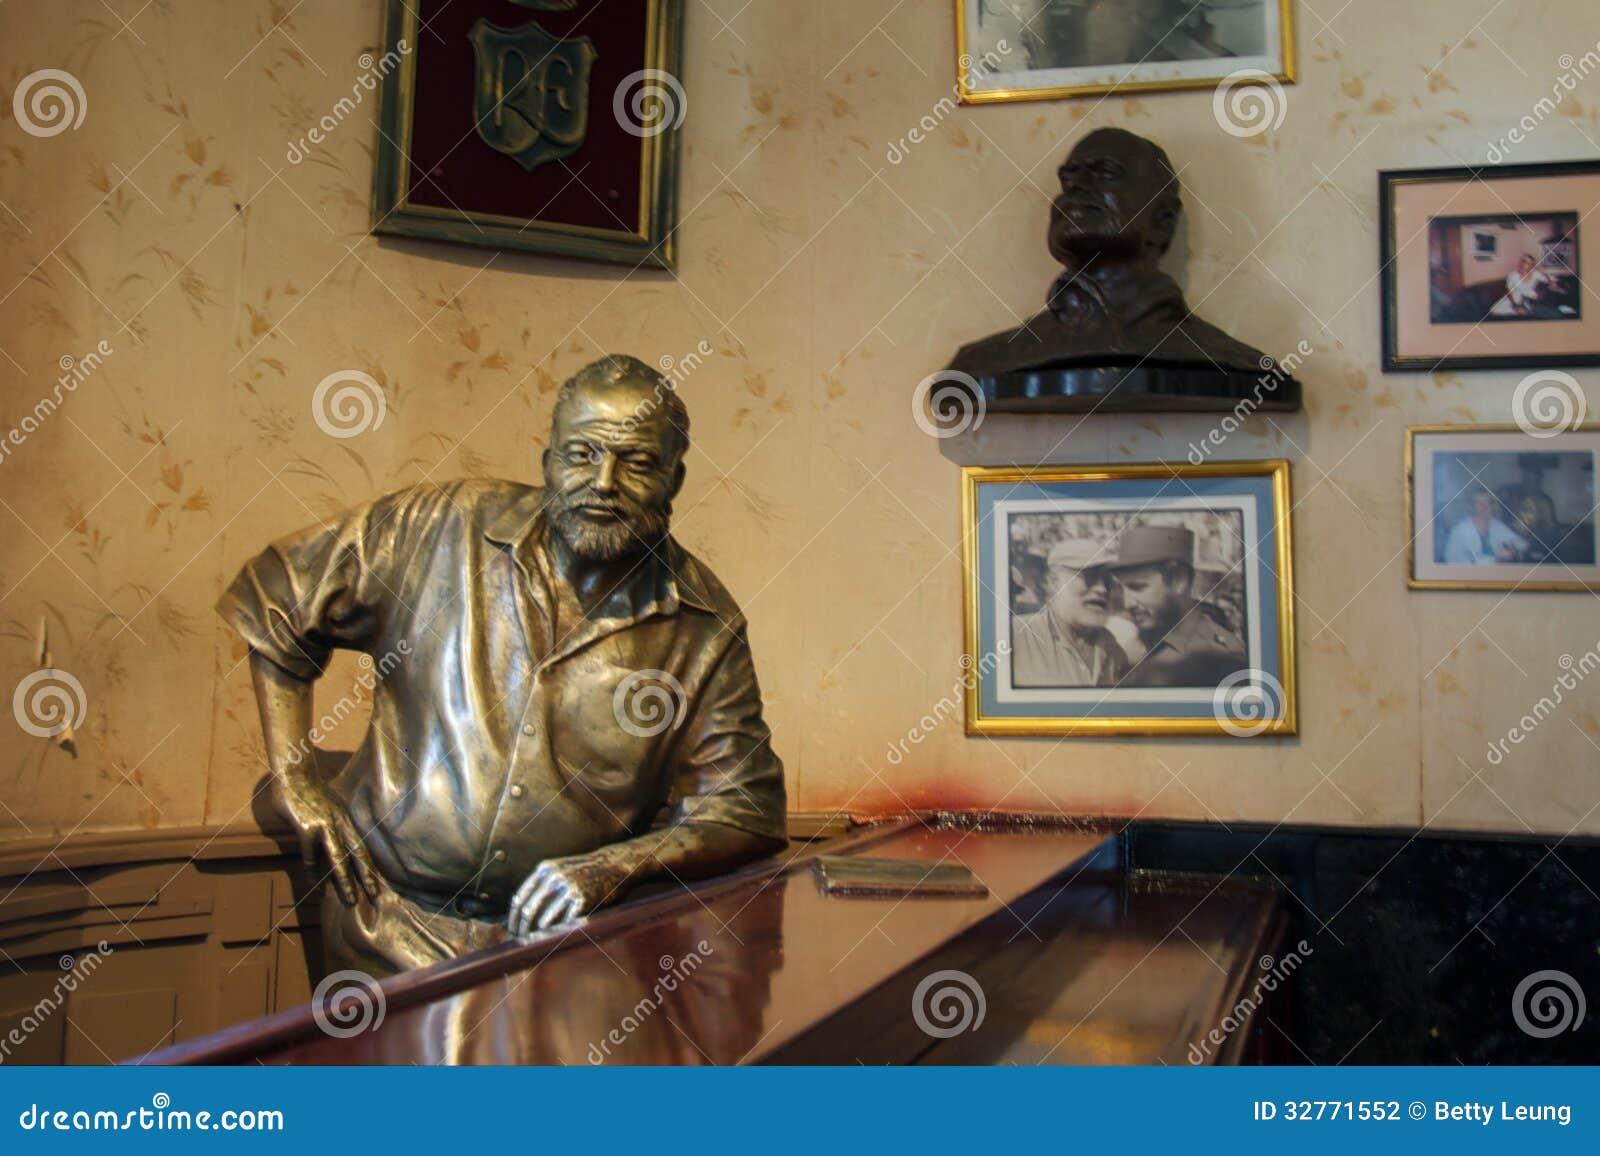 Ernest Hemingway Bronze Statue